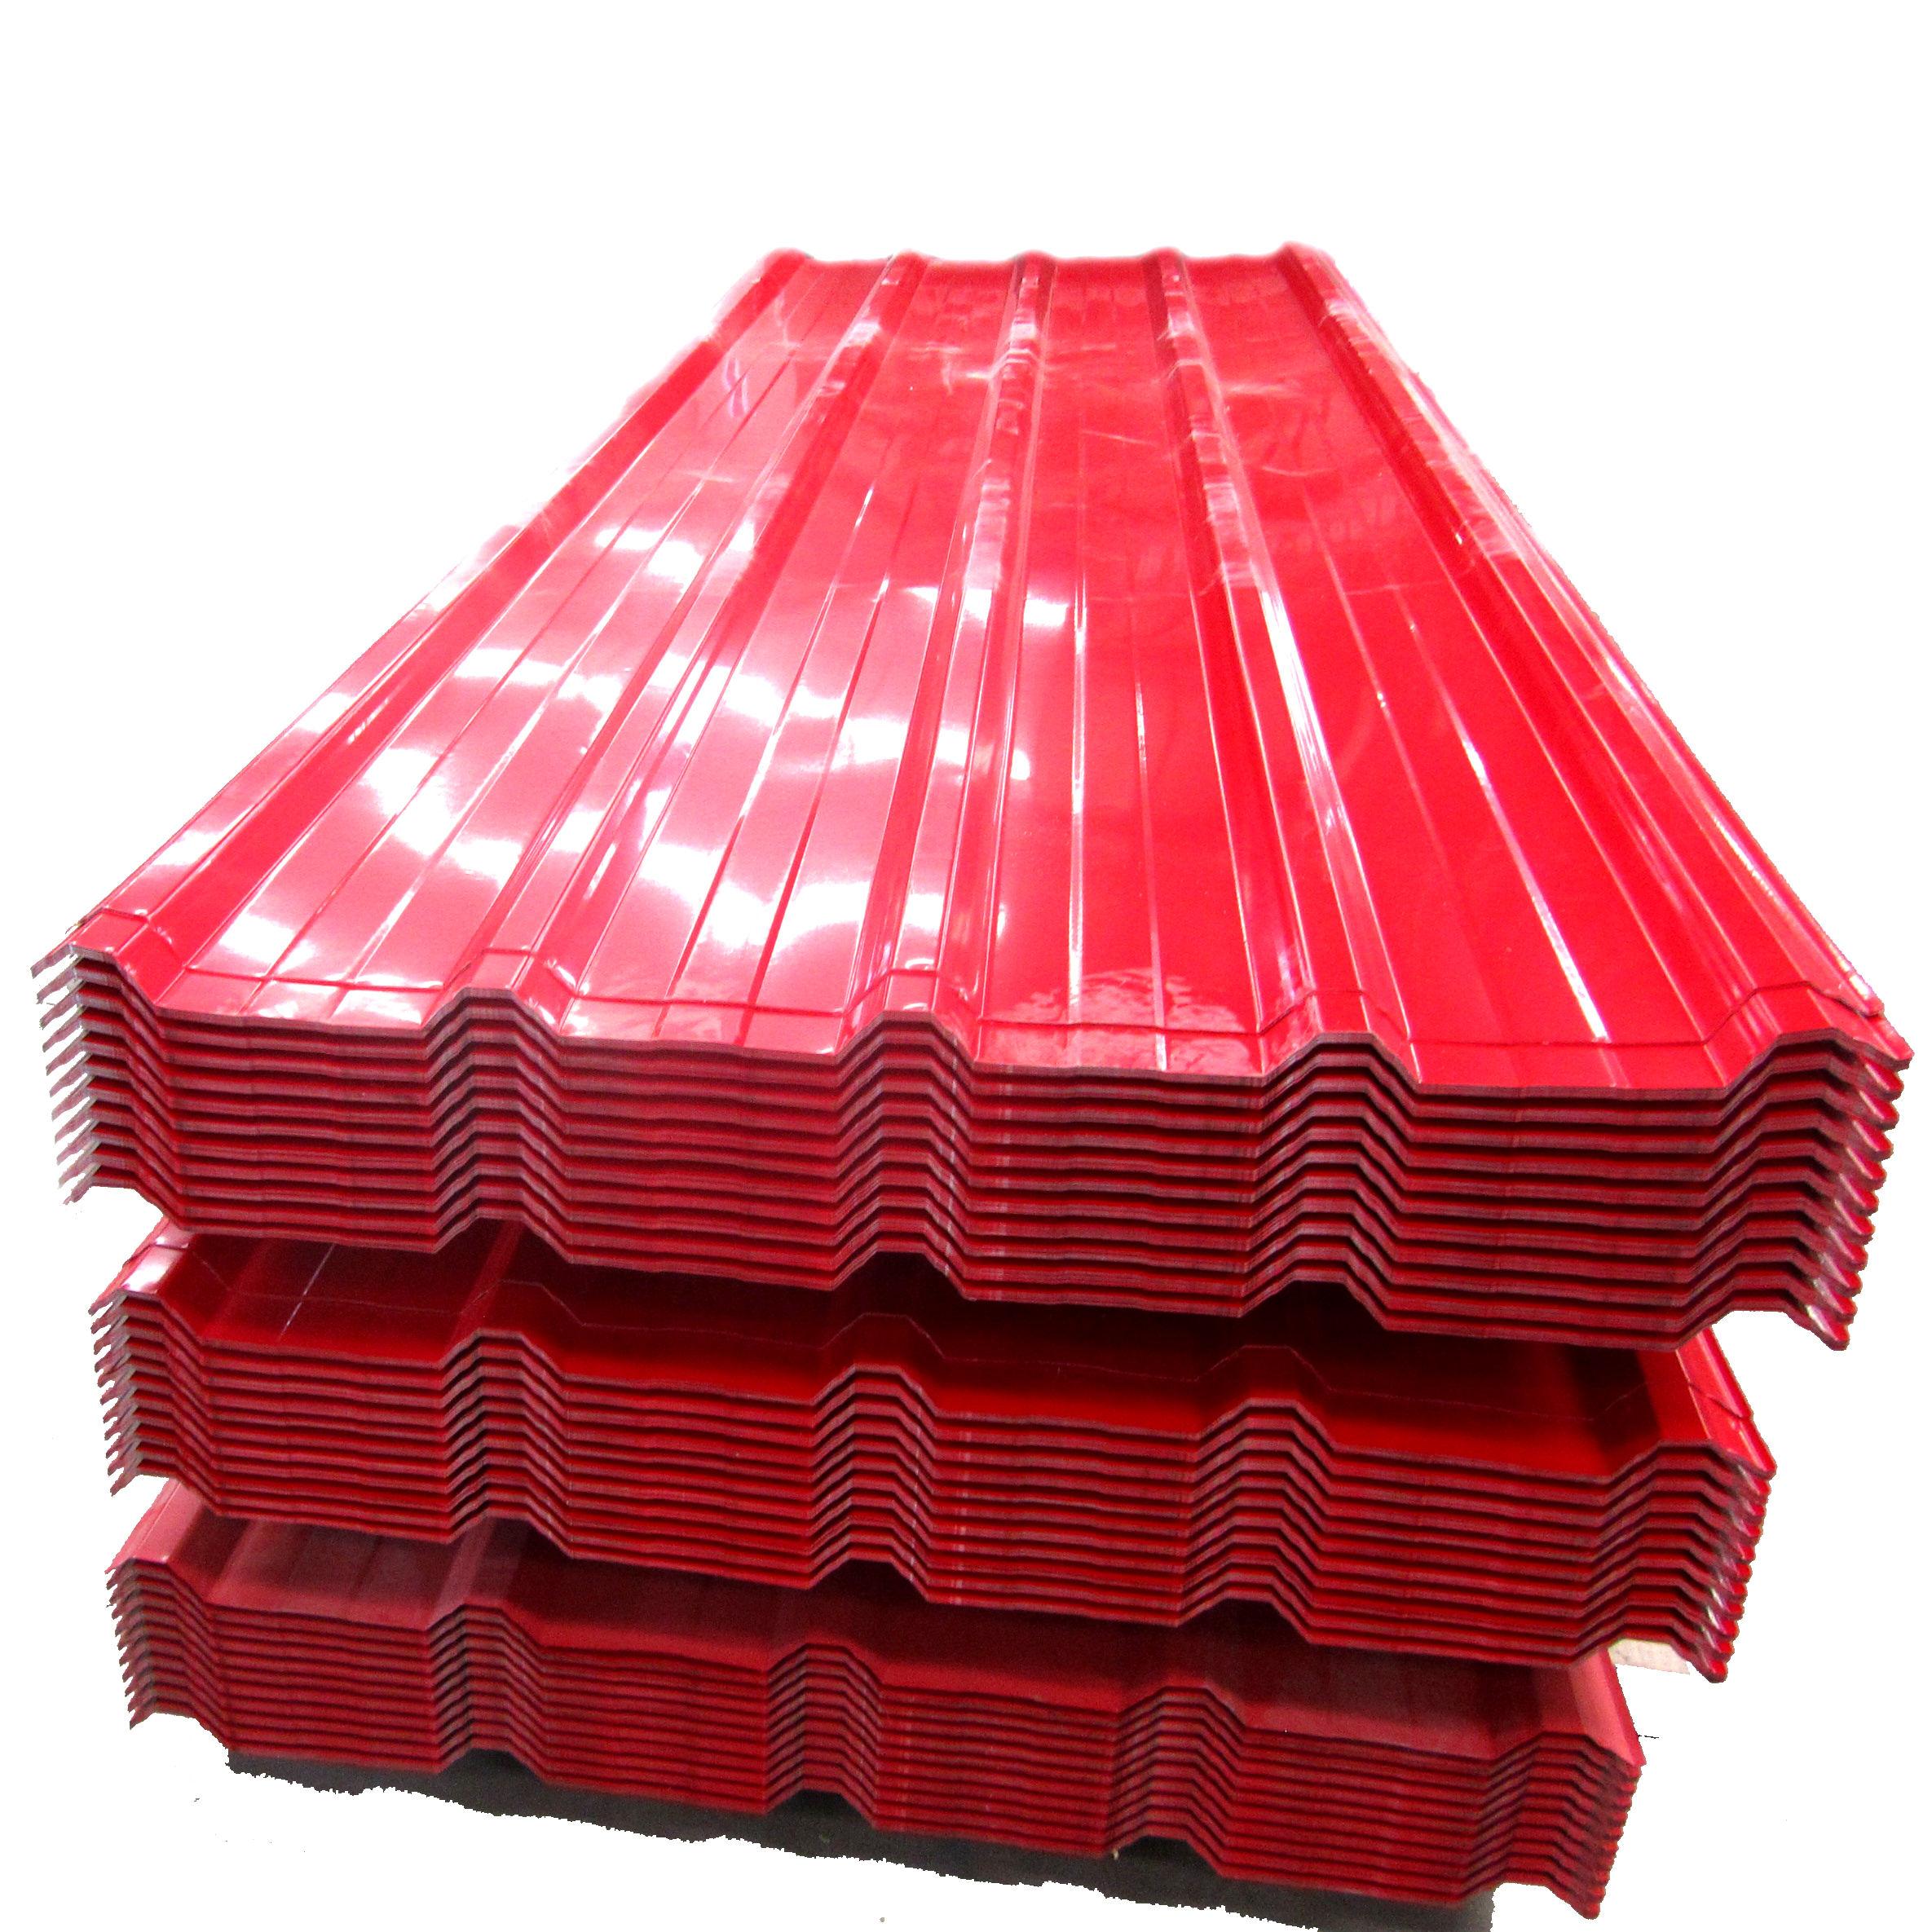 China Corrugated Zinc Steel Sheets China Corrugated Zinc Steel Sheets Manufacturers And Suppliers On Alibaba Com